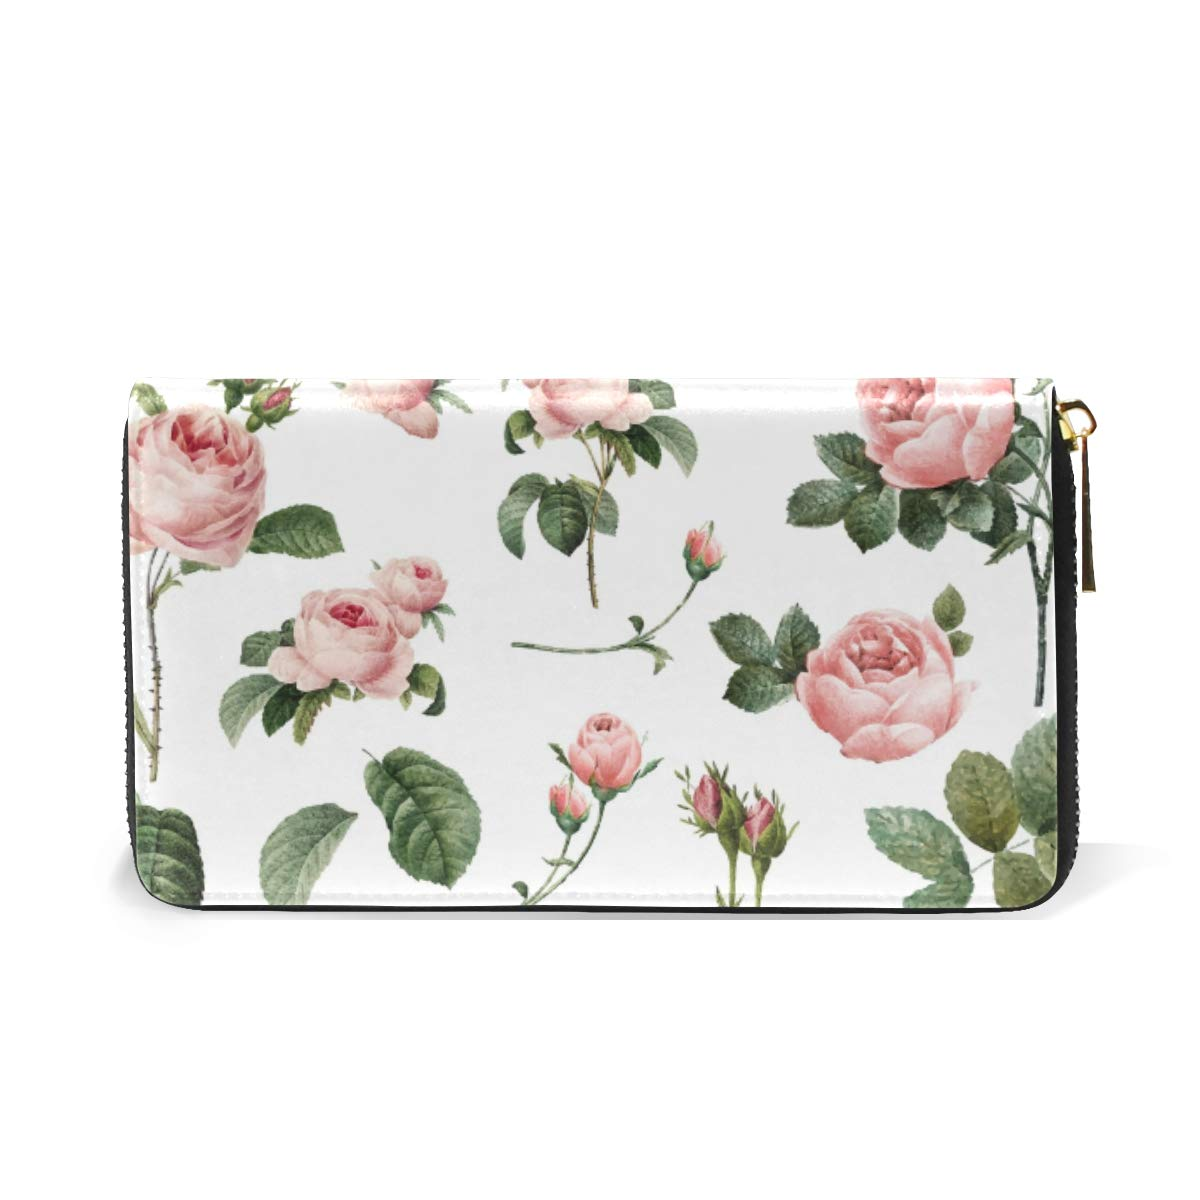 Flower Women Wallet Female Coin Purse Phone Clutch Pouch Girl Cash Bag Leather Card Change Holder Organizer Storage Key Hold Elegant Handbag For Party Birthday Gift